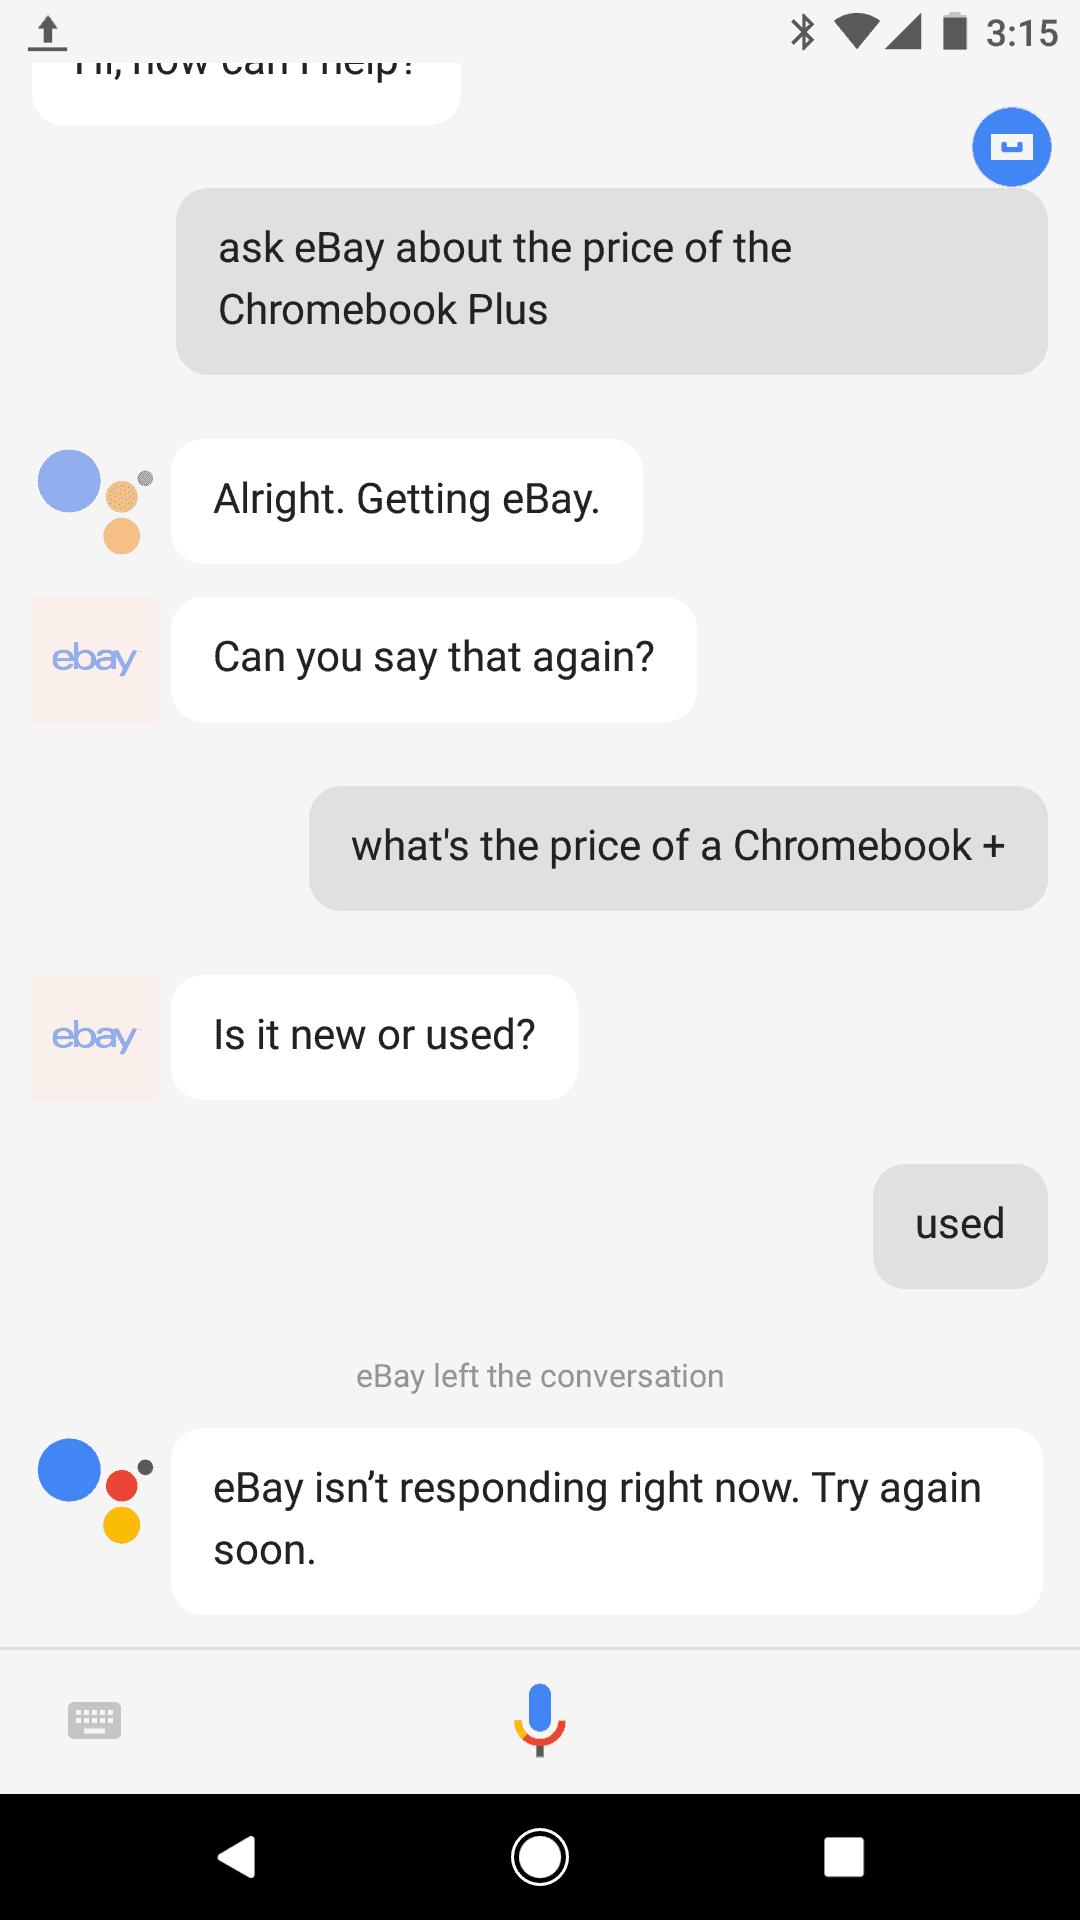 Google Assistant eBay Chatbot 1